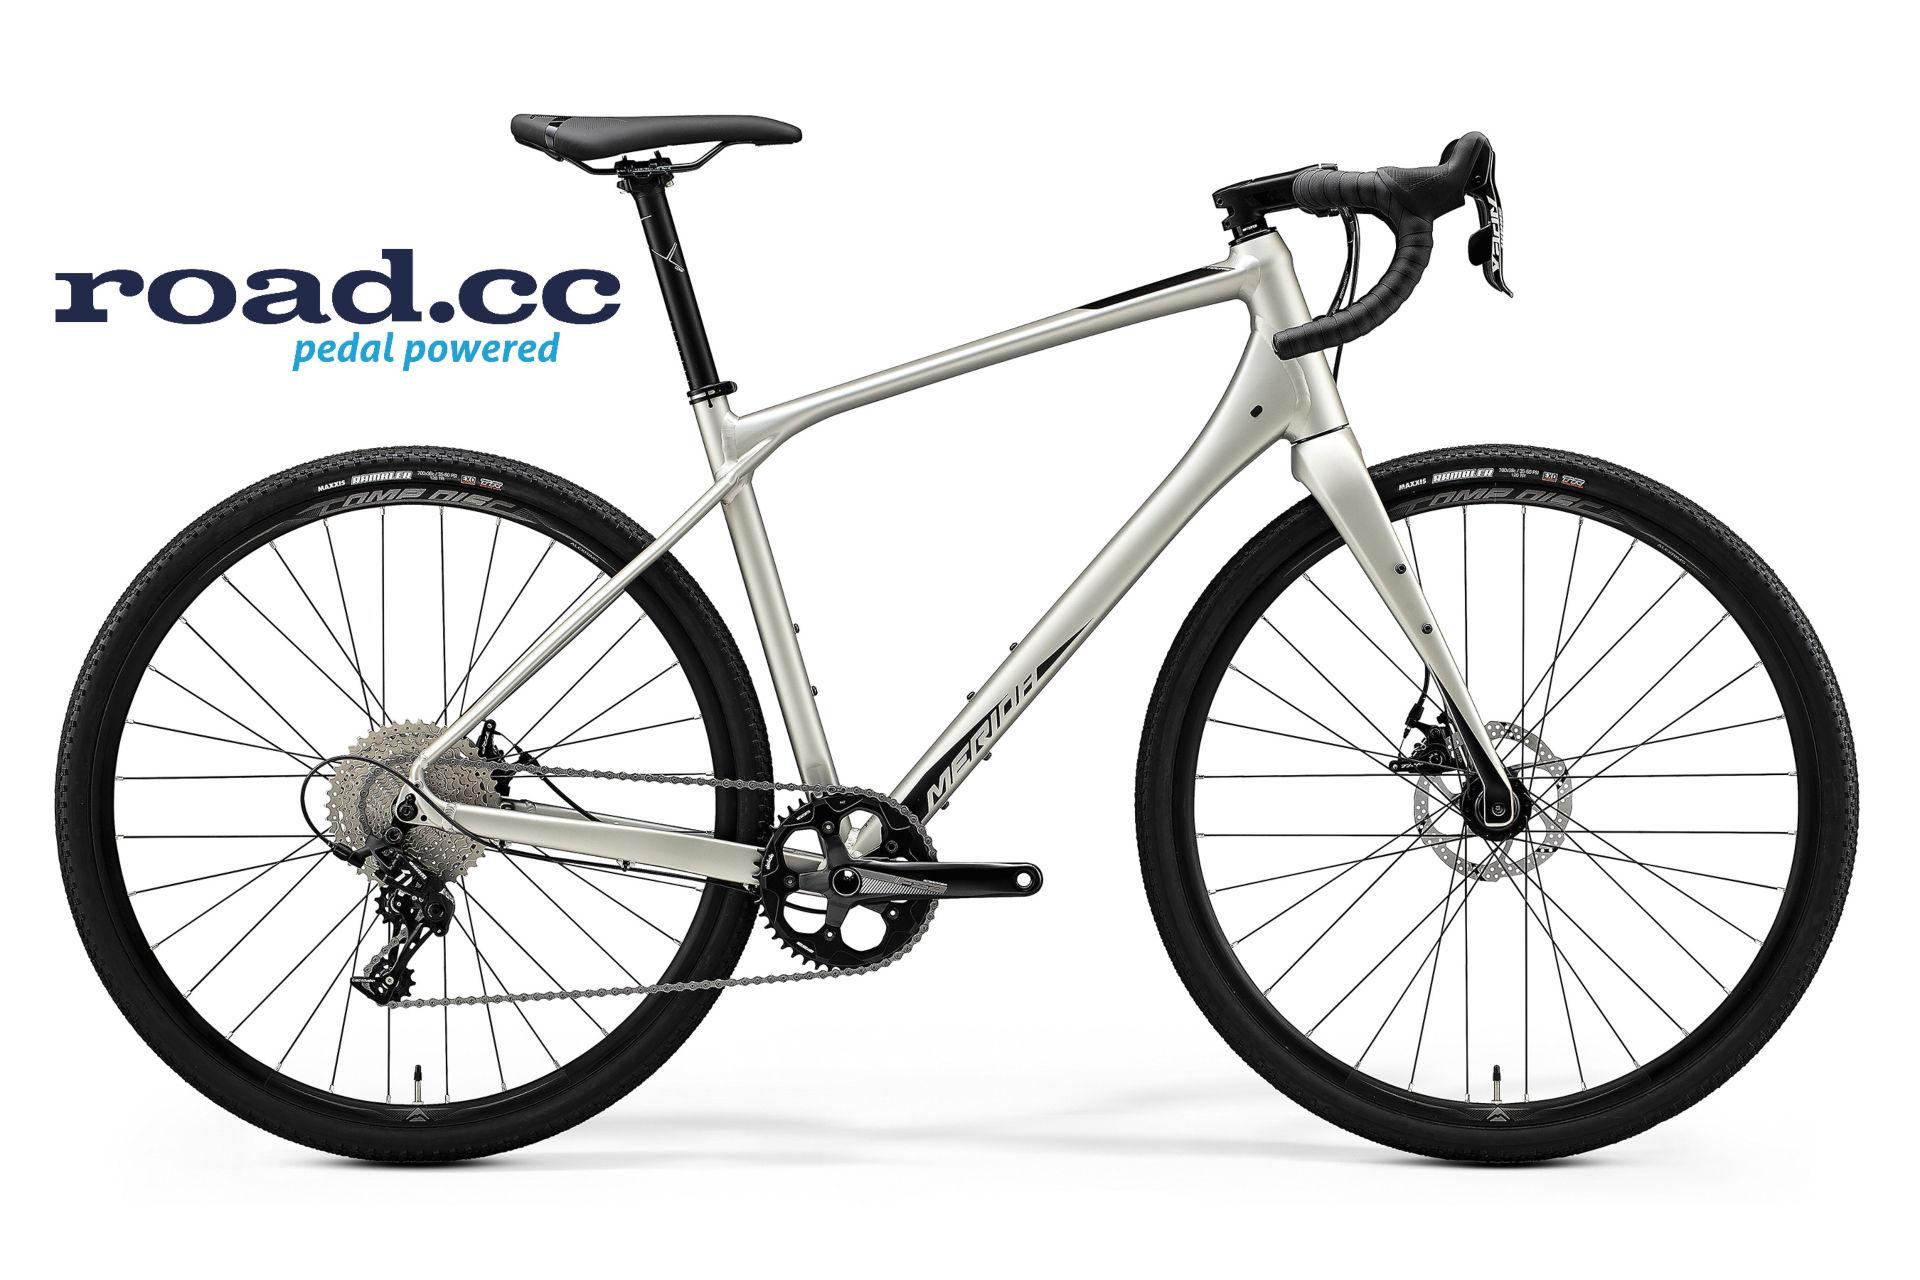 Merida Silex, Silex, gravel, bikepacking, wyprawy rowerowe, rower gravel, rowery gravelowe, Merida Silex 300, Silex 300